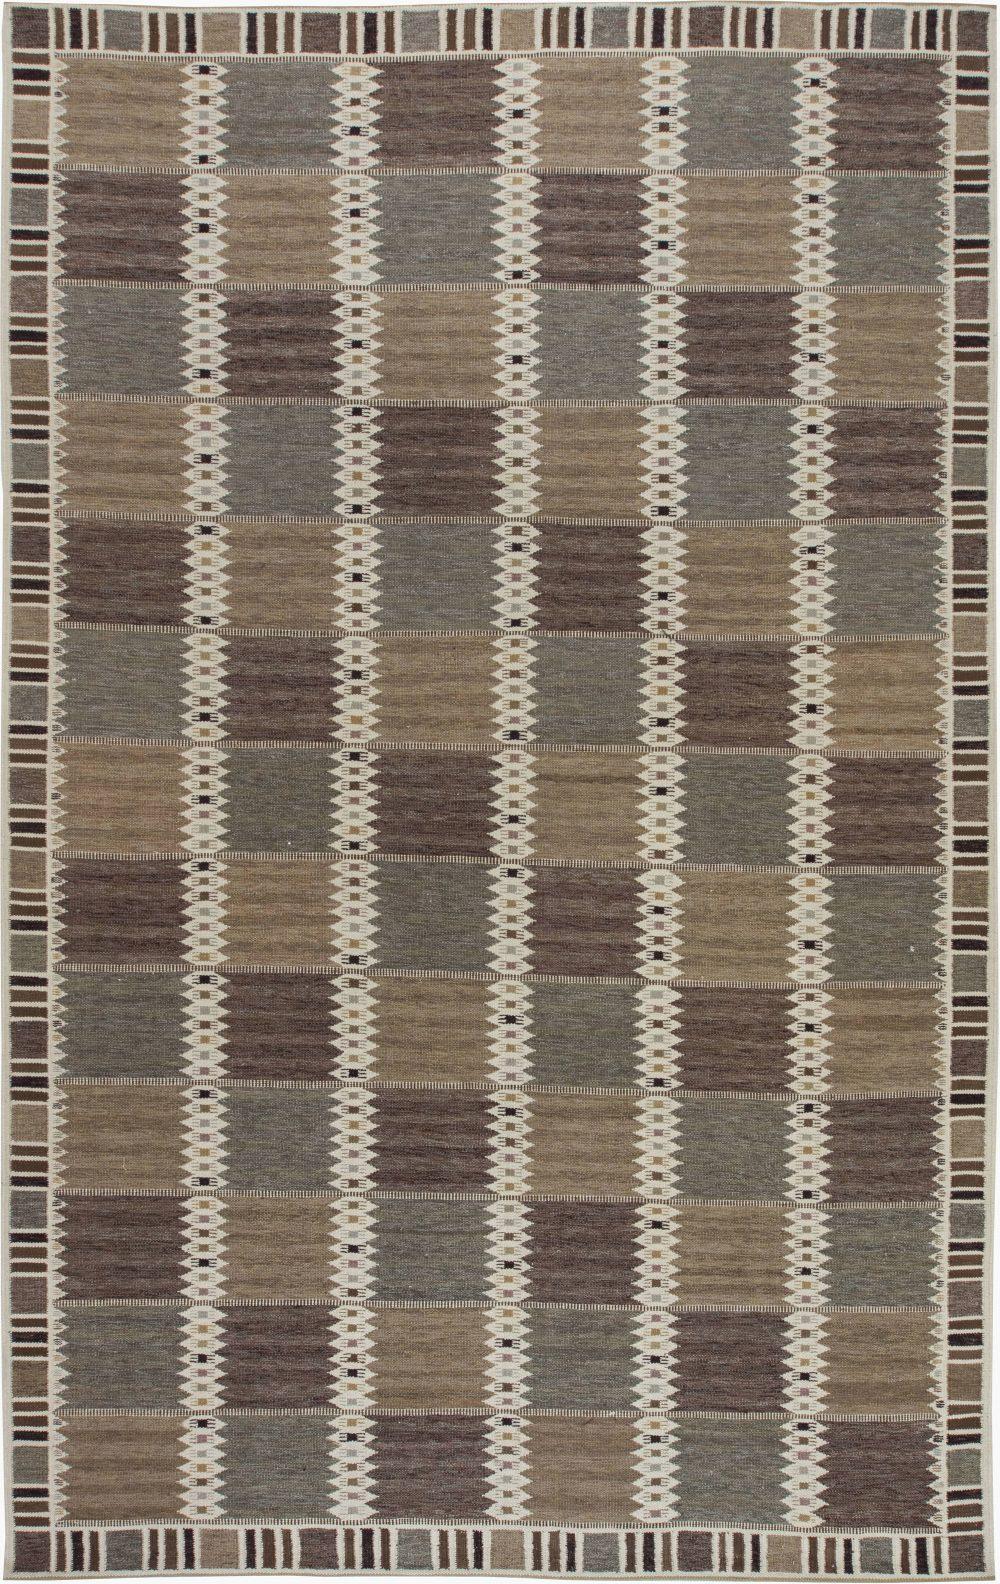 Swedish Design Flat Weave Rug N11581